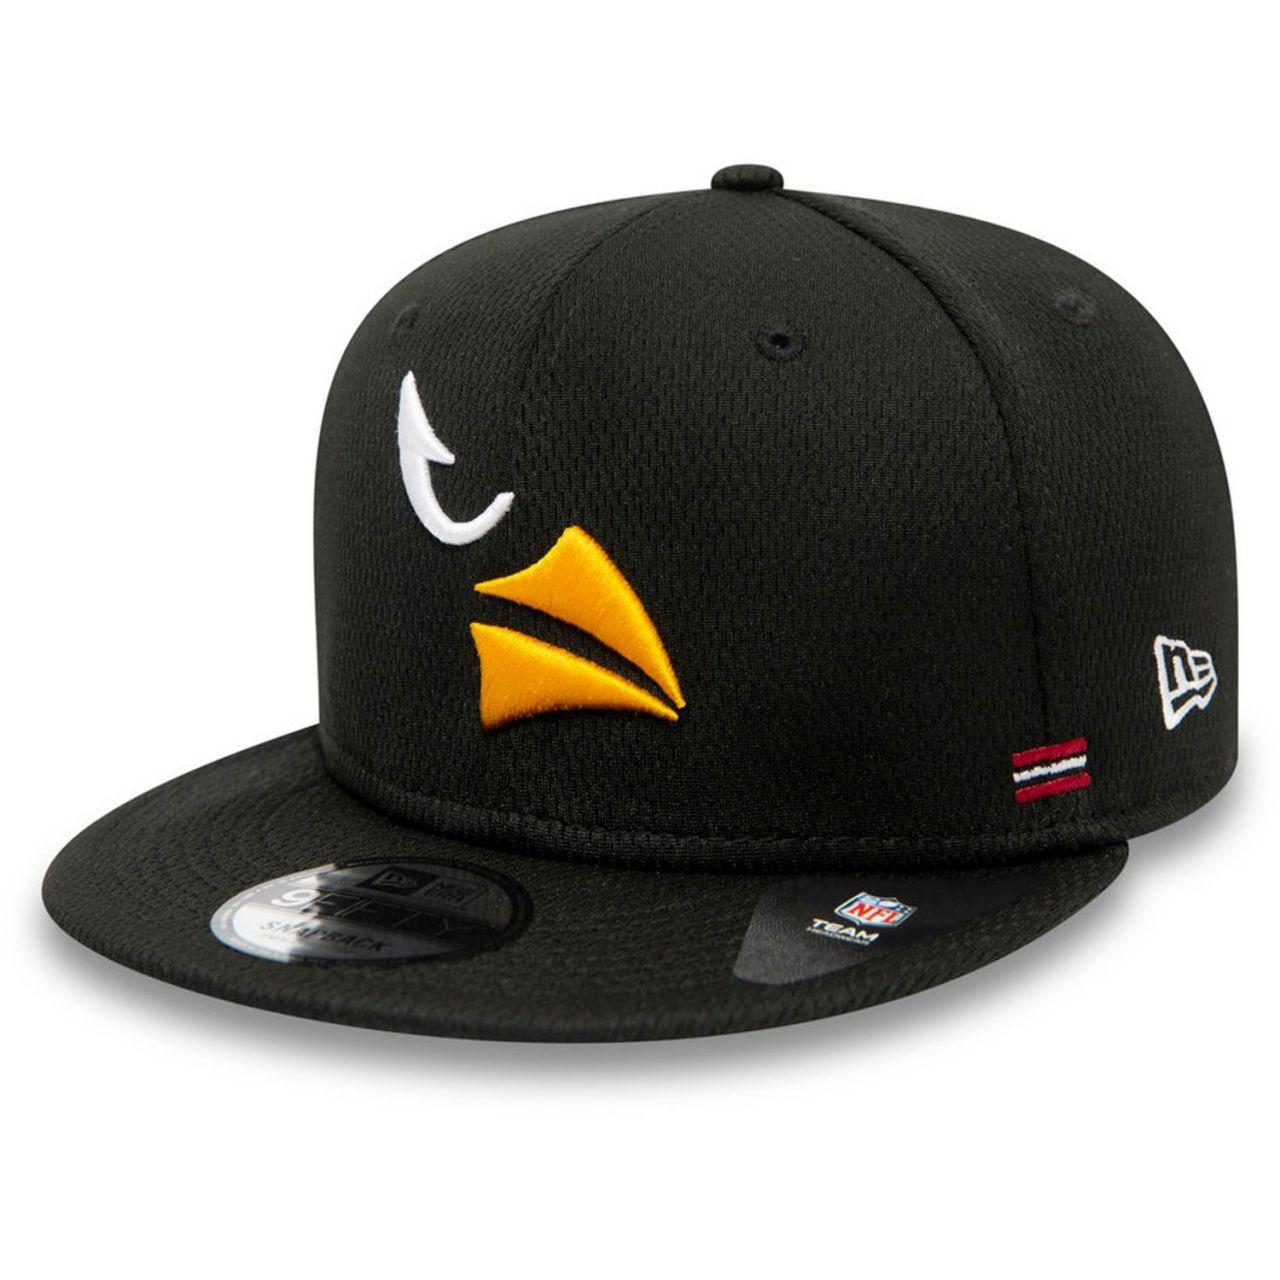 amfoo - New Era 9FIFTY Snapback Cap - HOMETOWN Arizona Cardinals